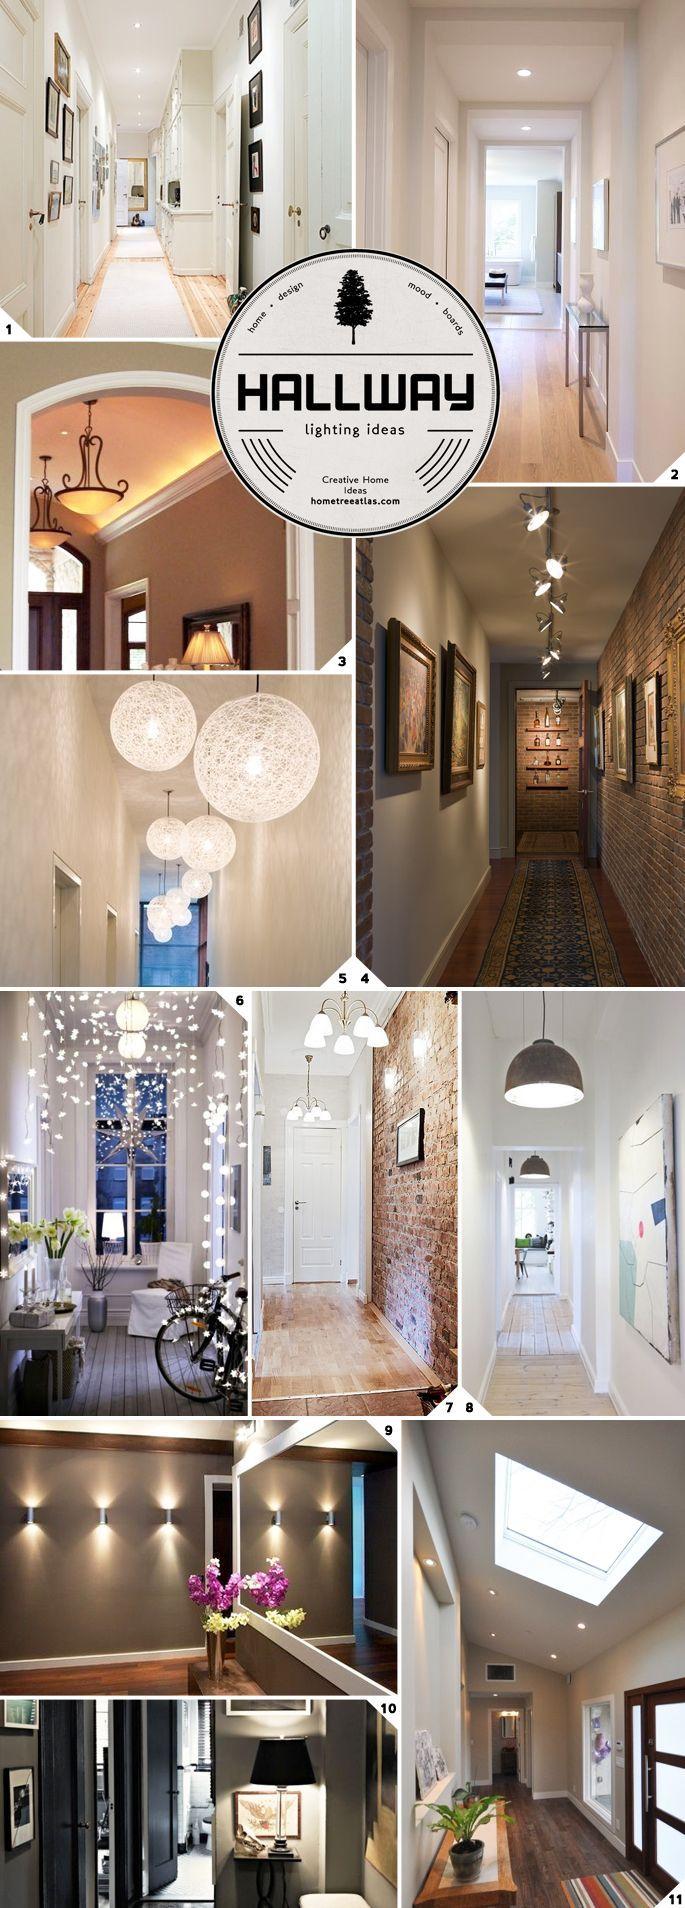 1950s hallway ideas   best narrow spaces images on Pinterest  Home ideas Hallway